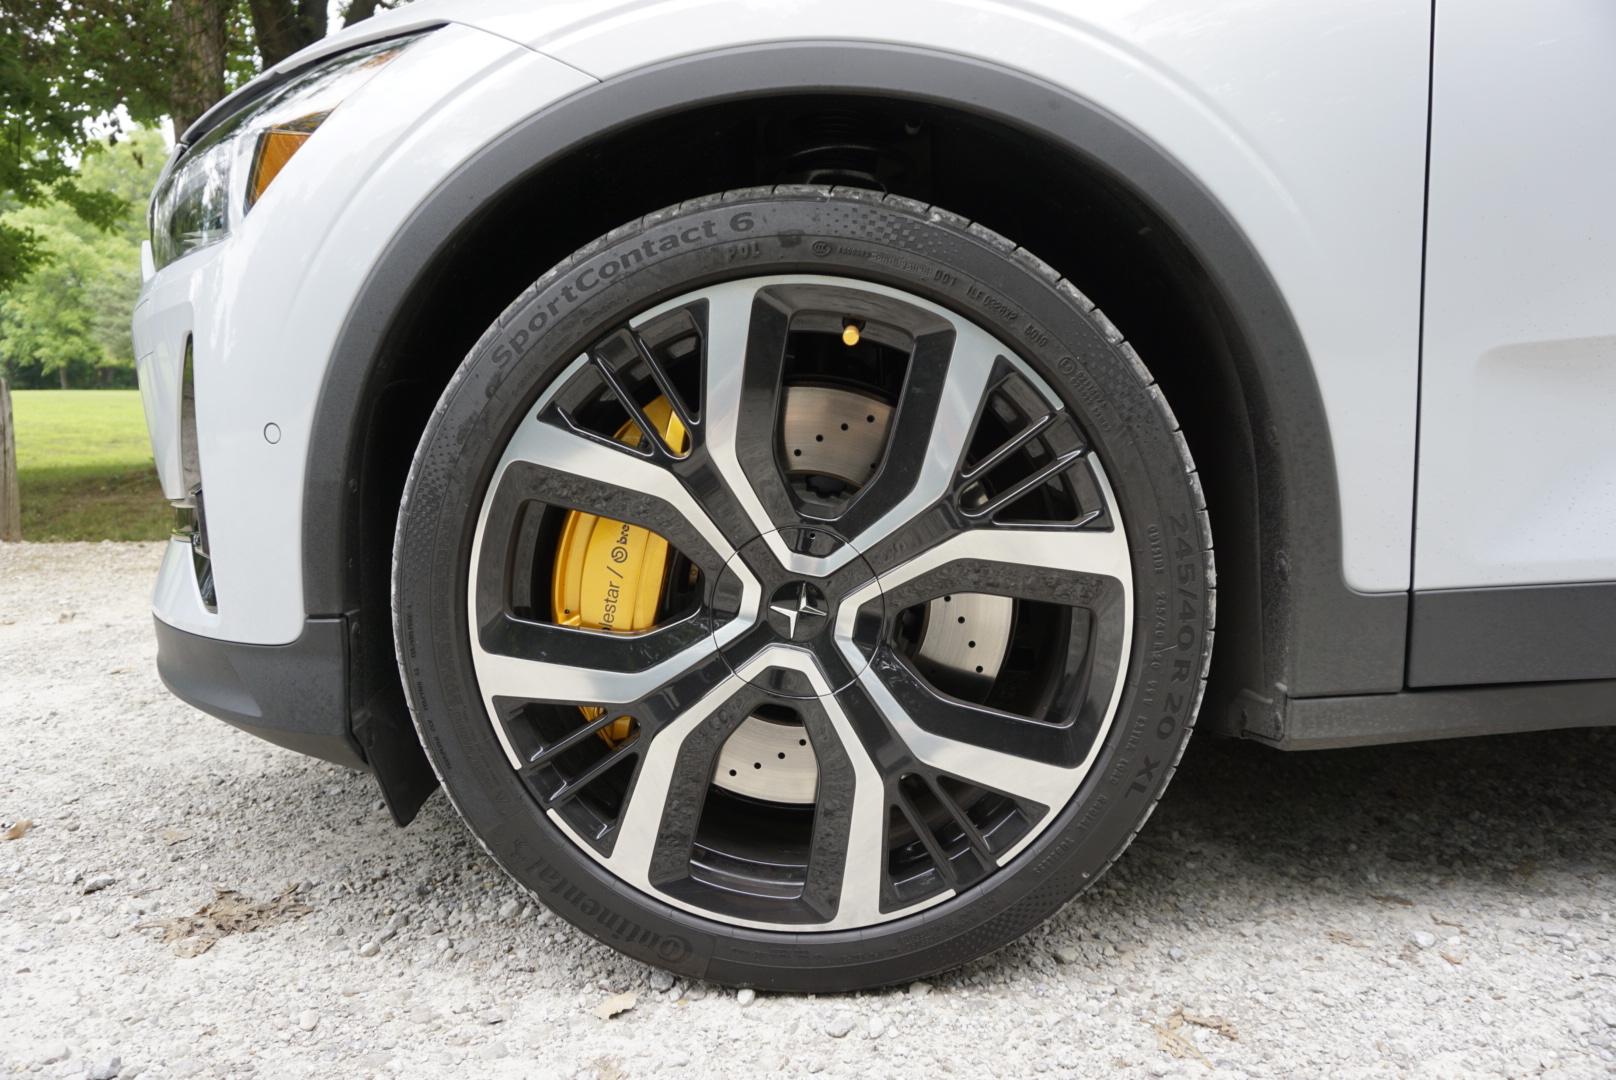 Polestar 2 front wheel brake and tire